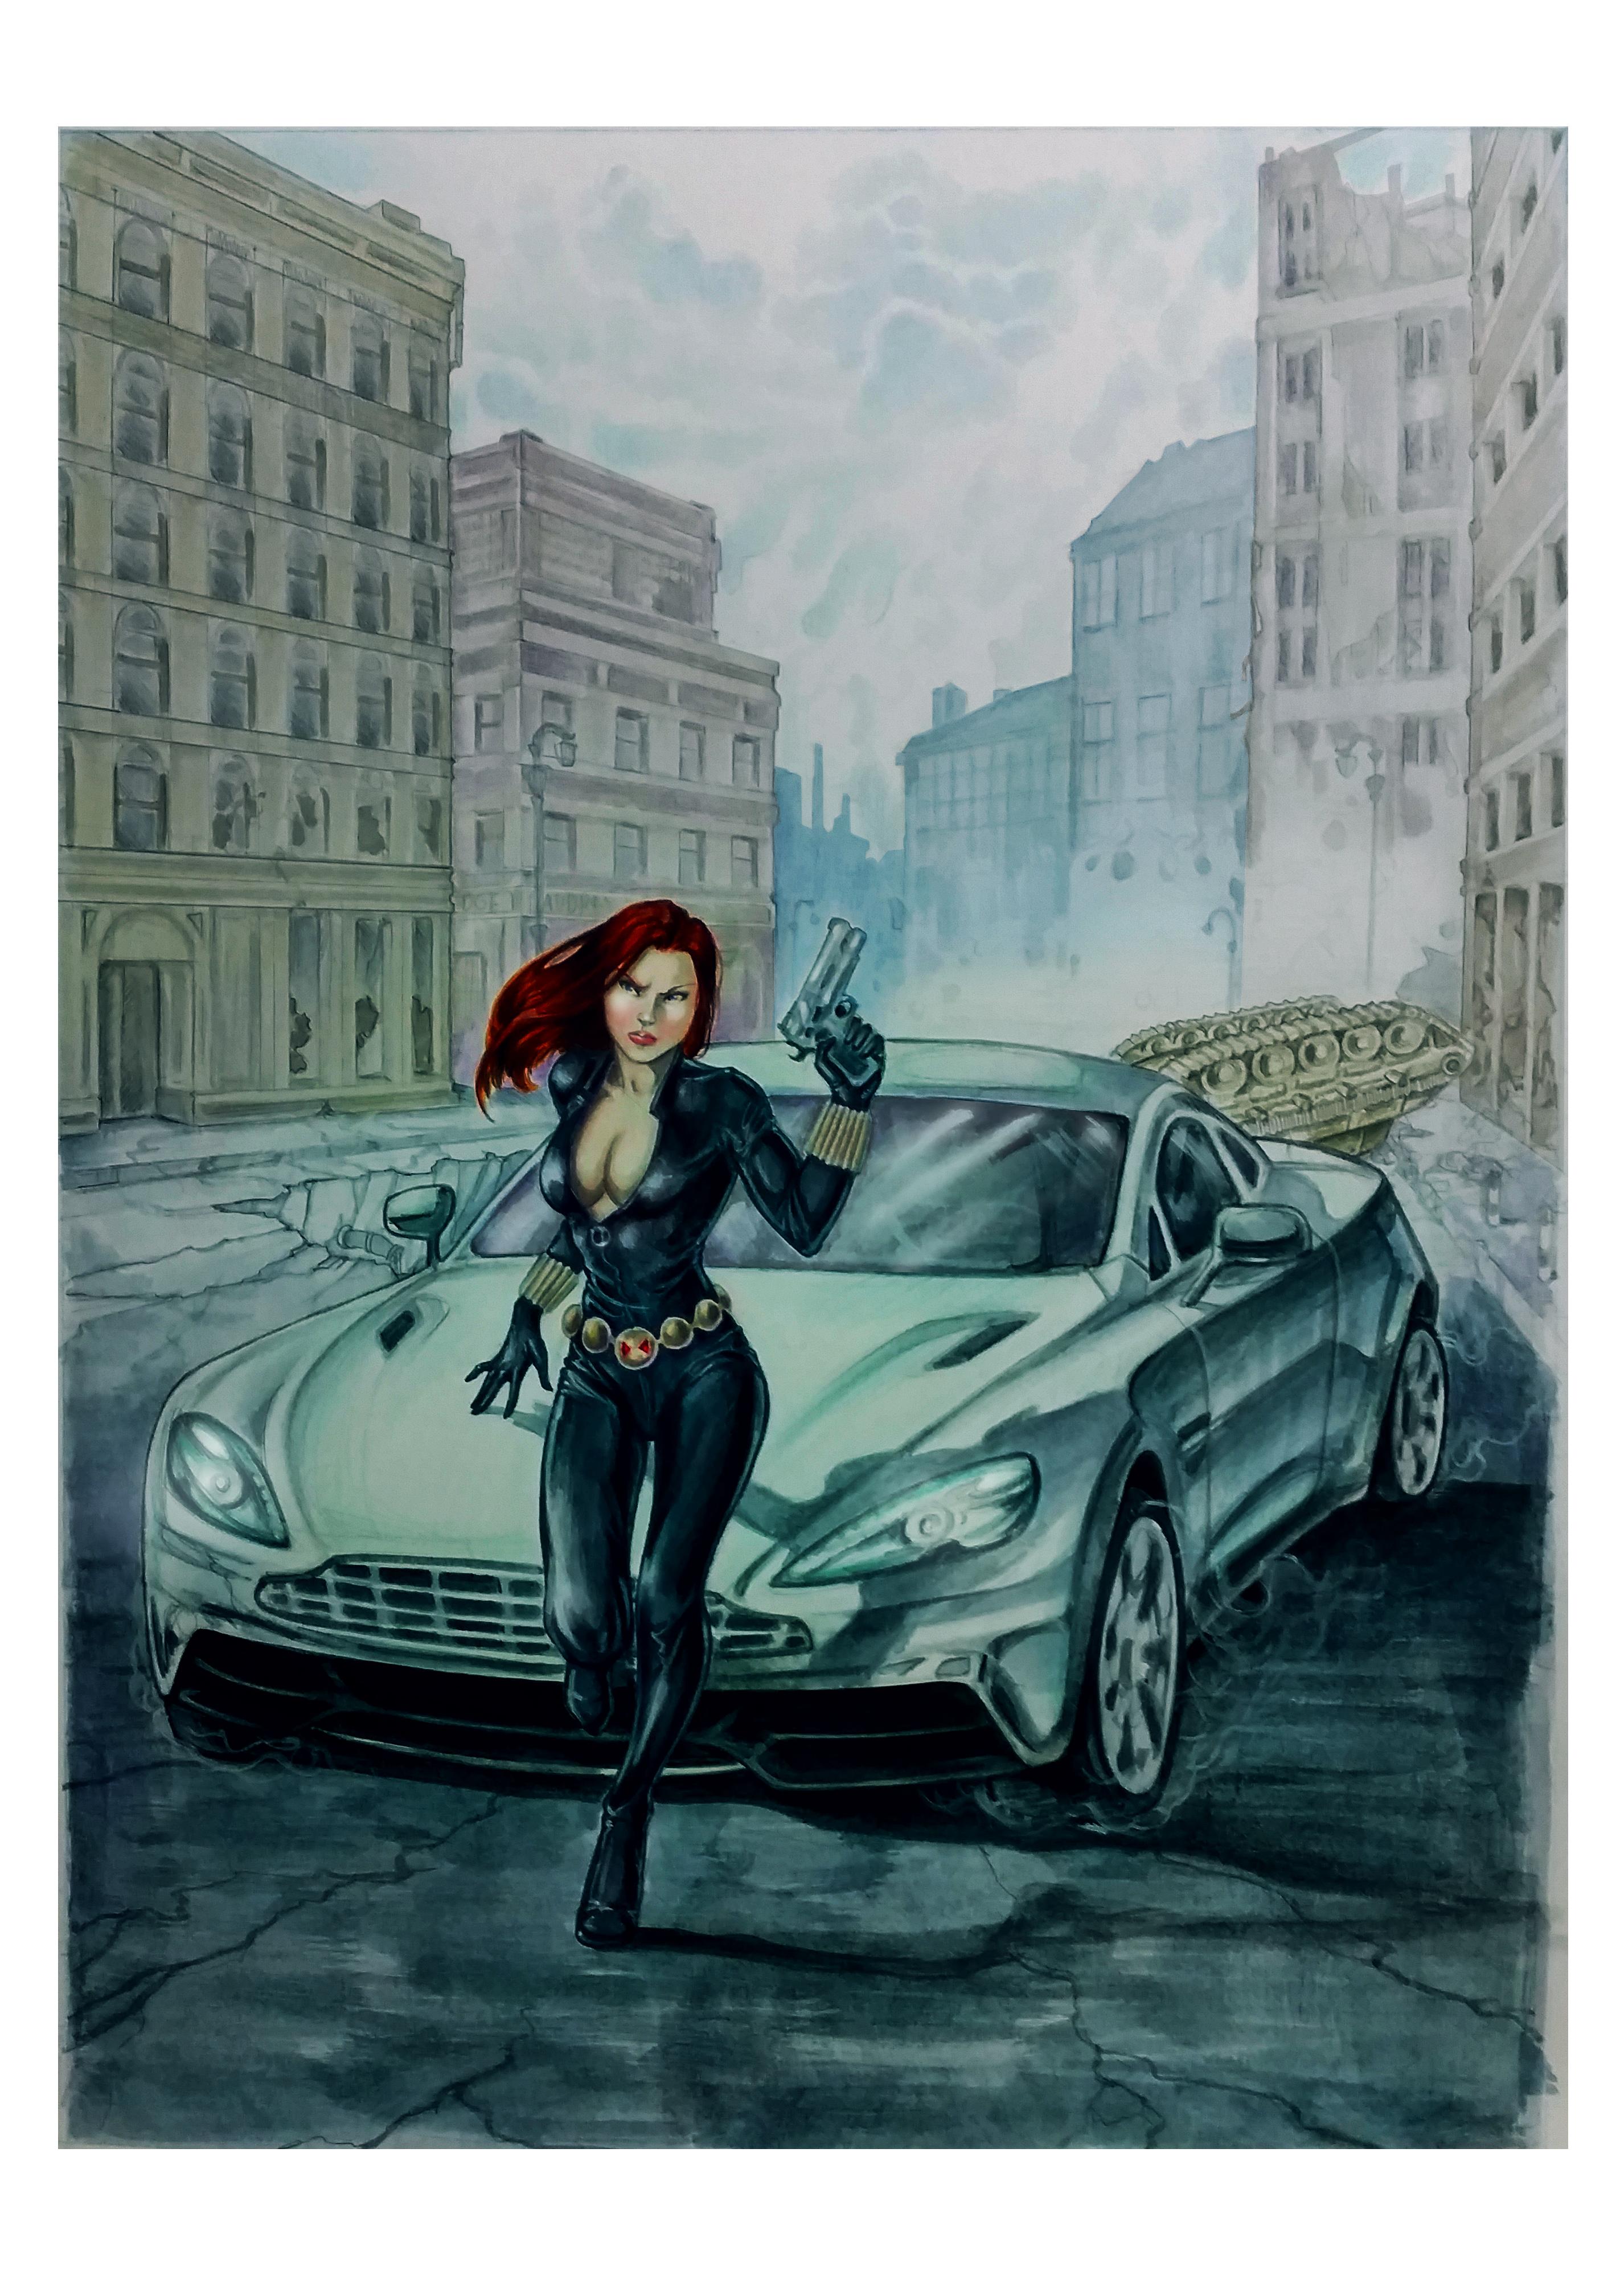 The Black Widow